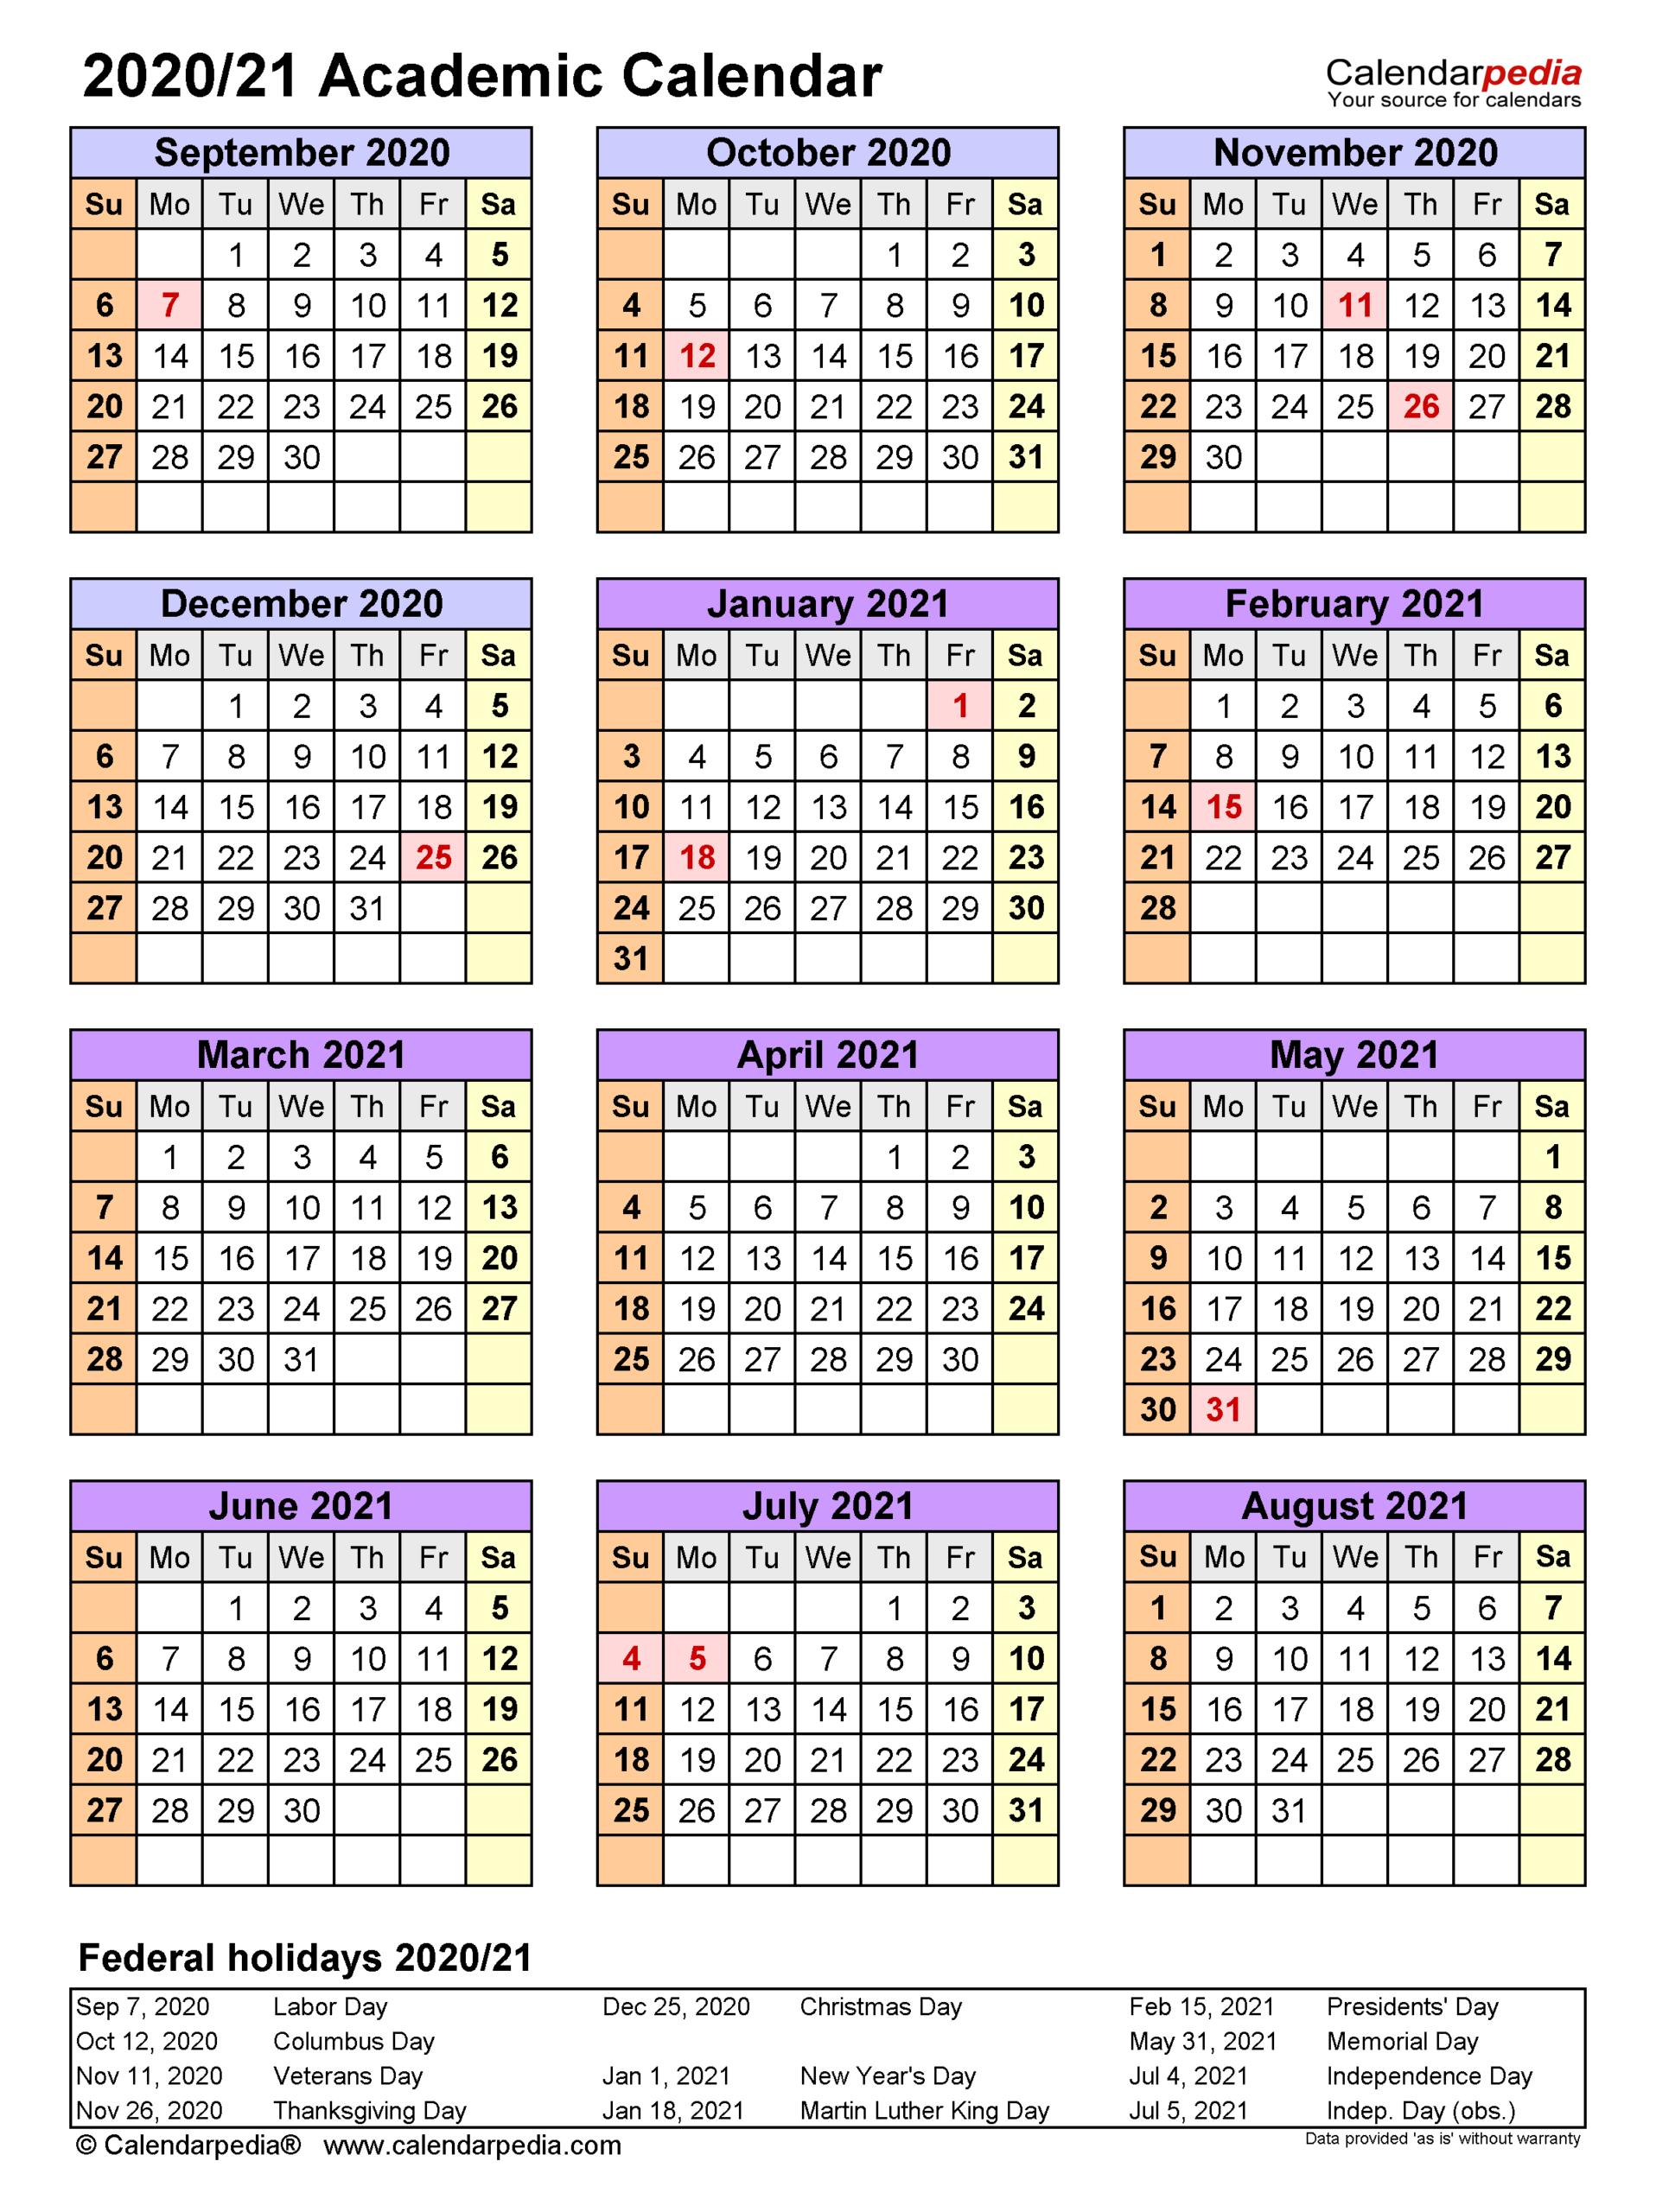 Academic Calendars 2020/2021 - Free Printable Word Templates pertaining to Vertex Academic Calendar